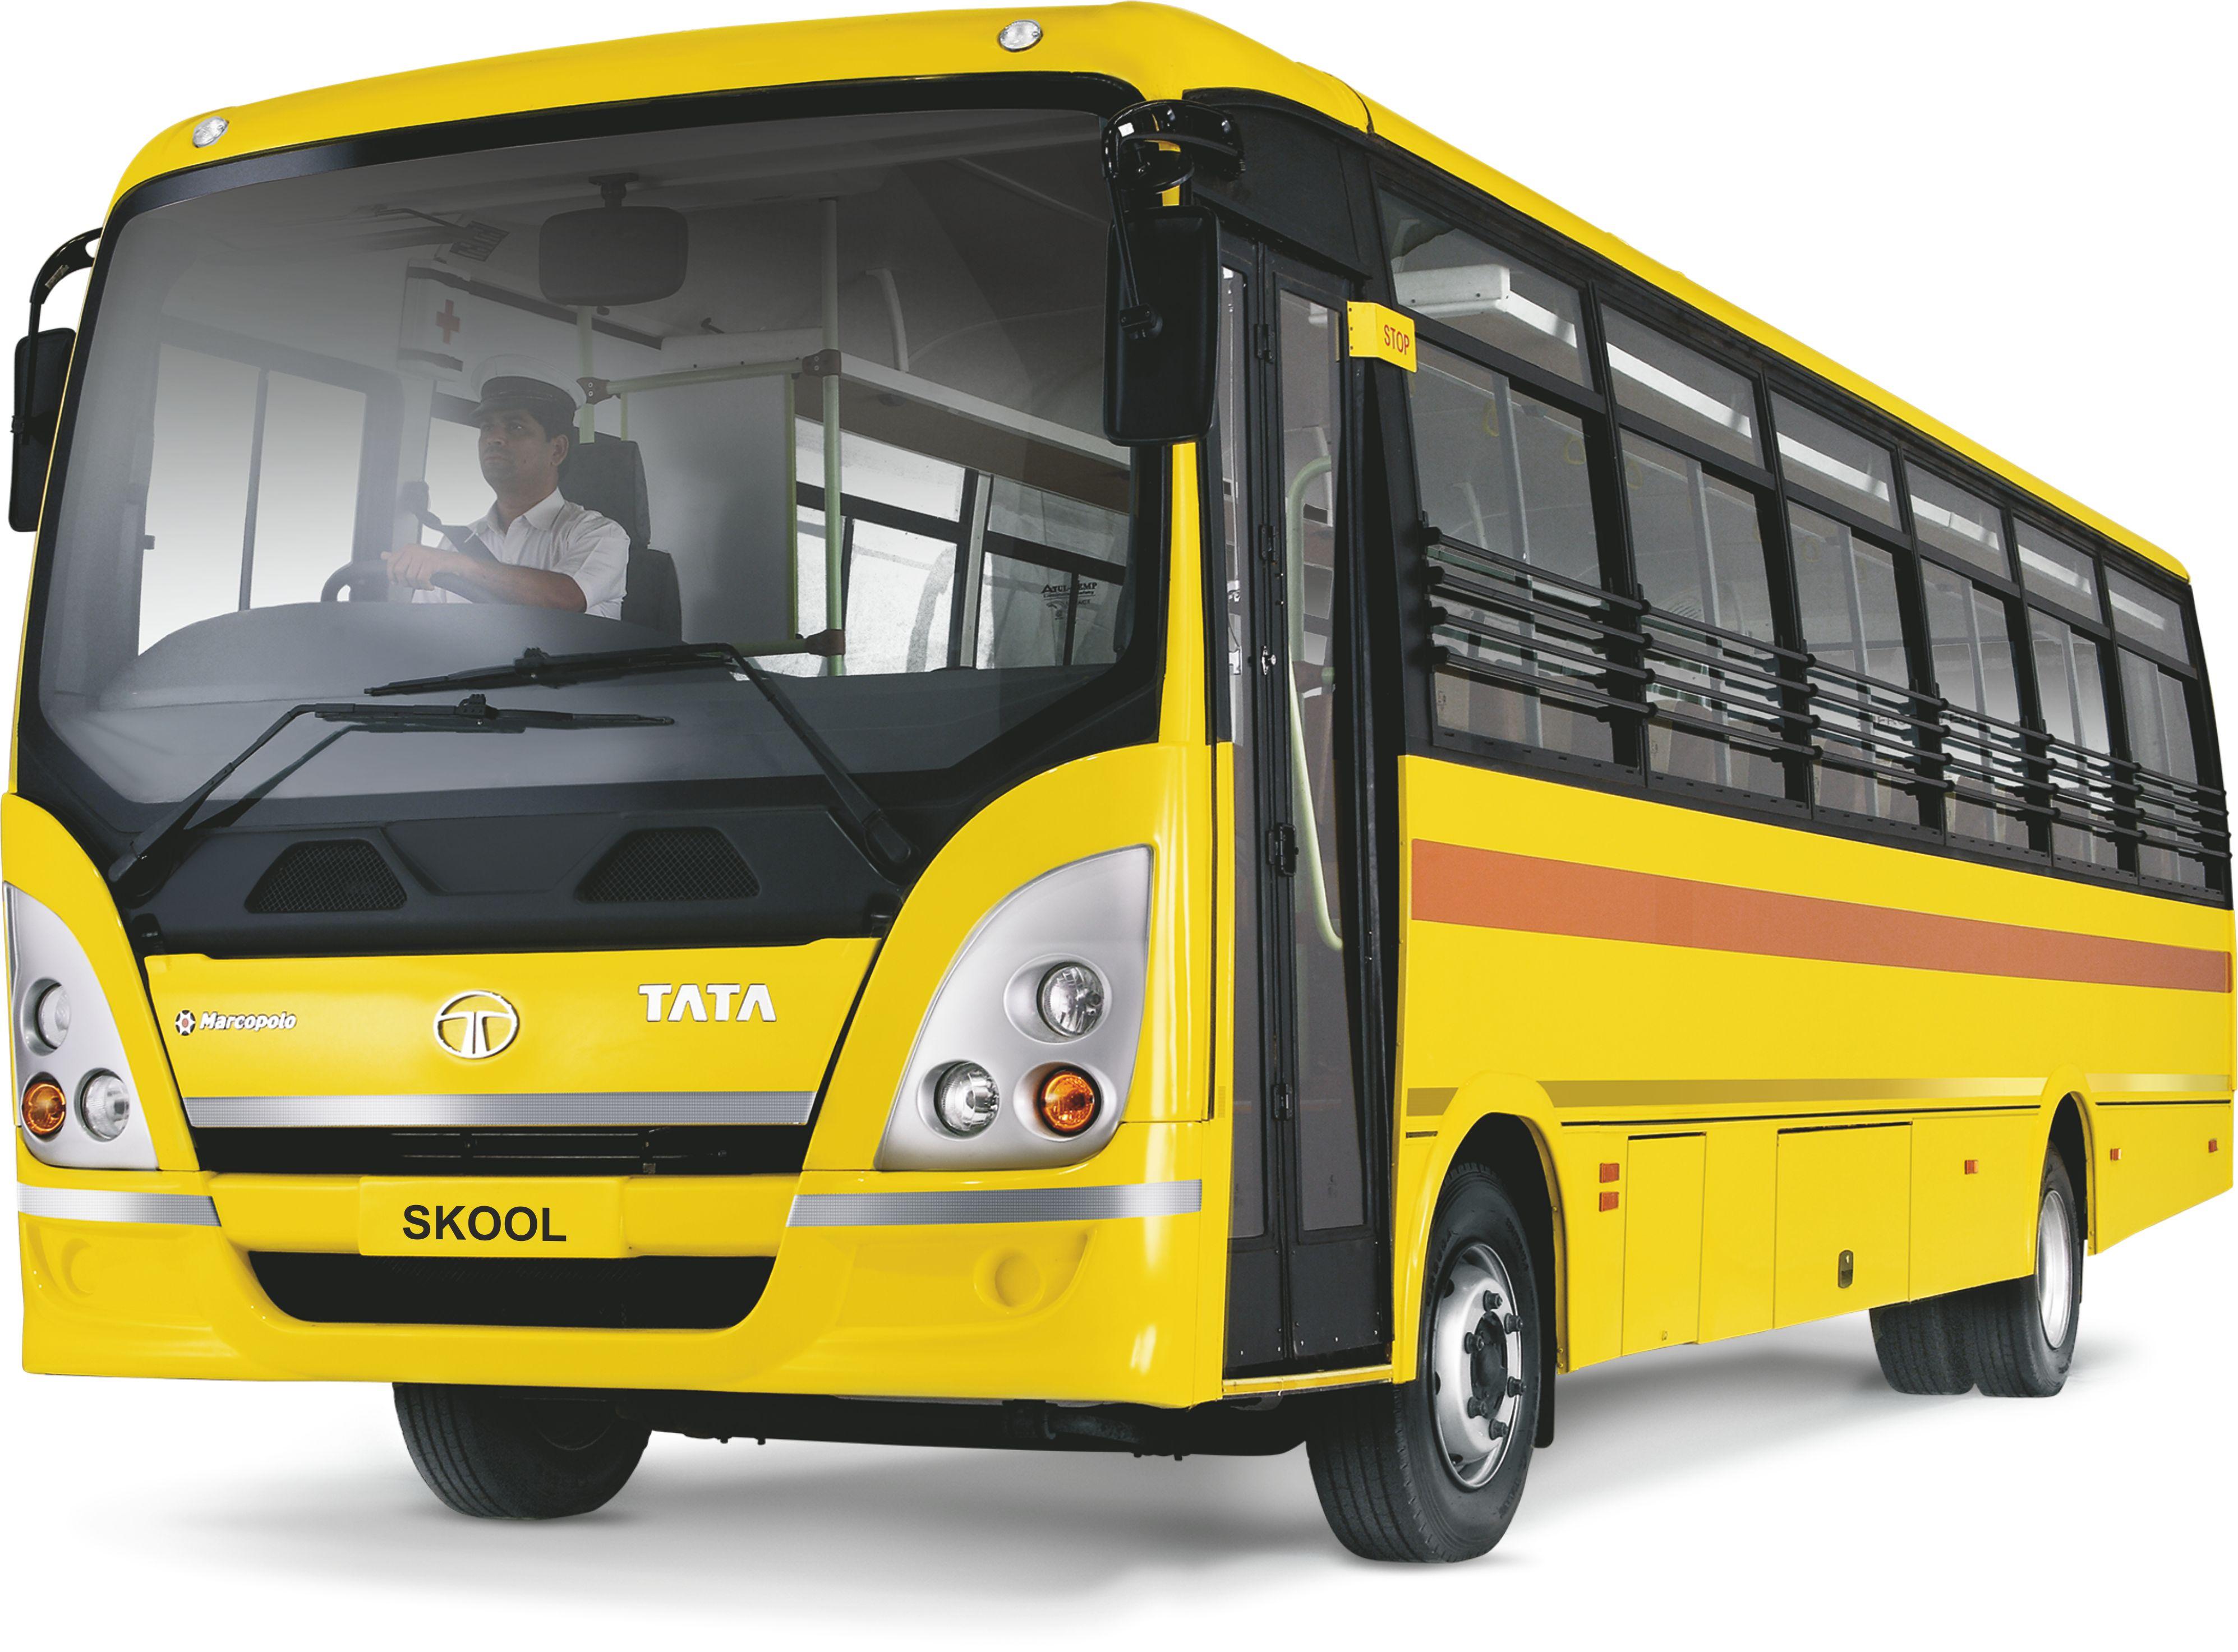 Tata Trains School Bus Staff Through Hamare Bus Ki Baat